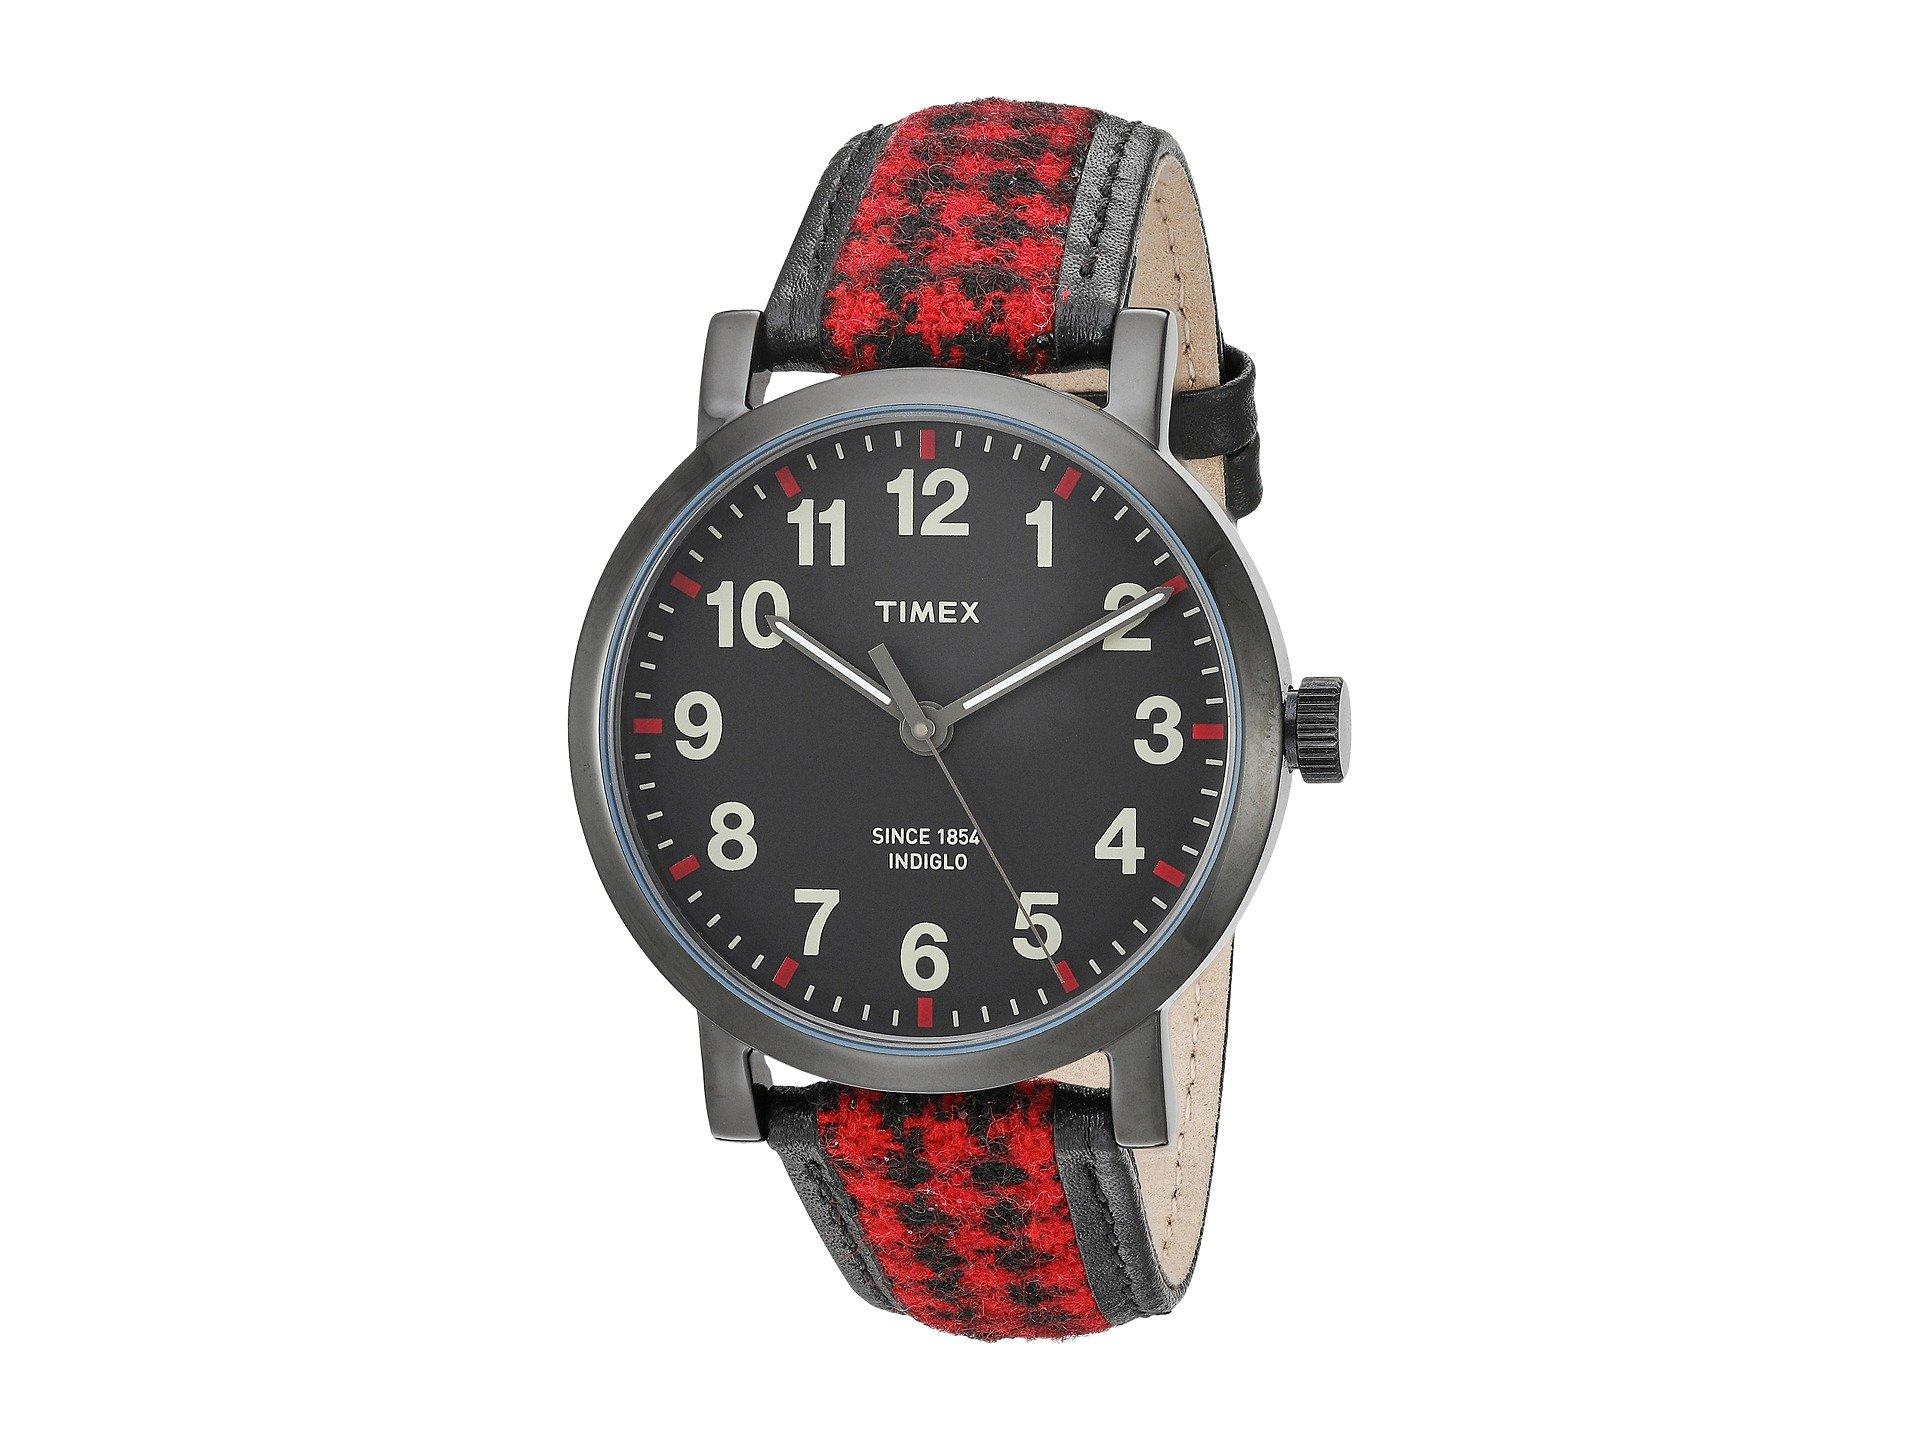 Reloj para Mujer Timex Originals Houndstooth 40mm  + Timex en VeoyCompro.net